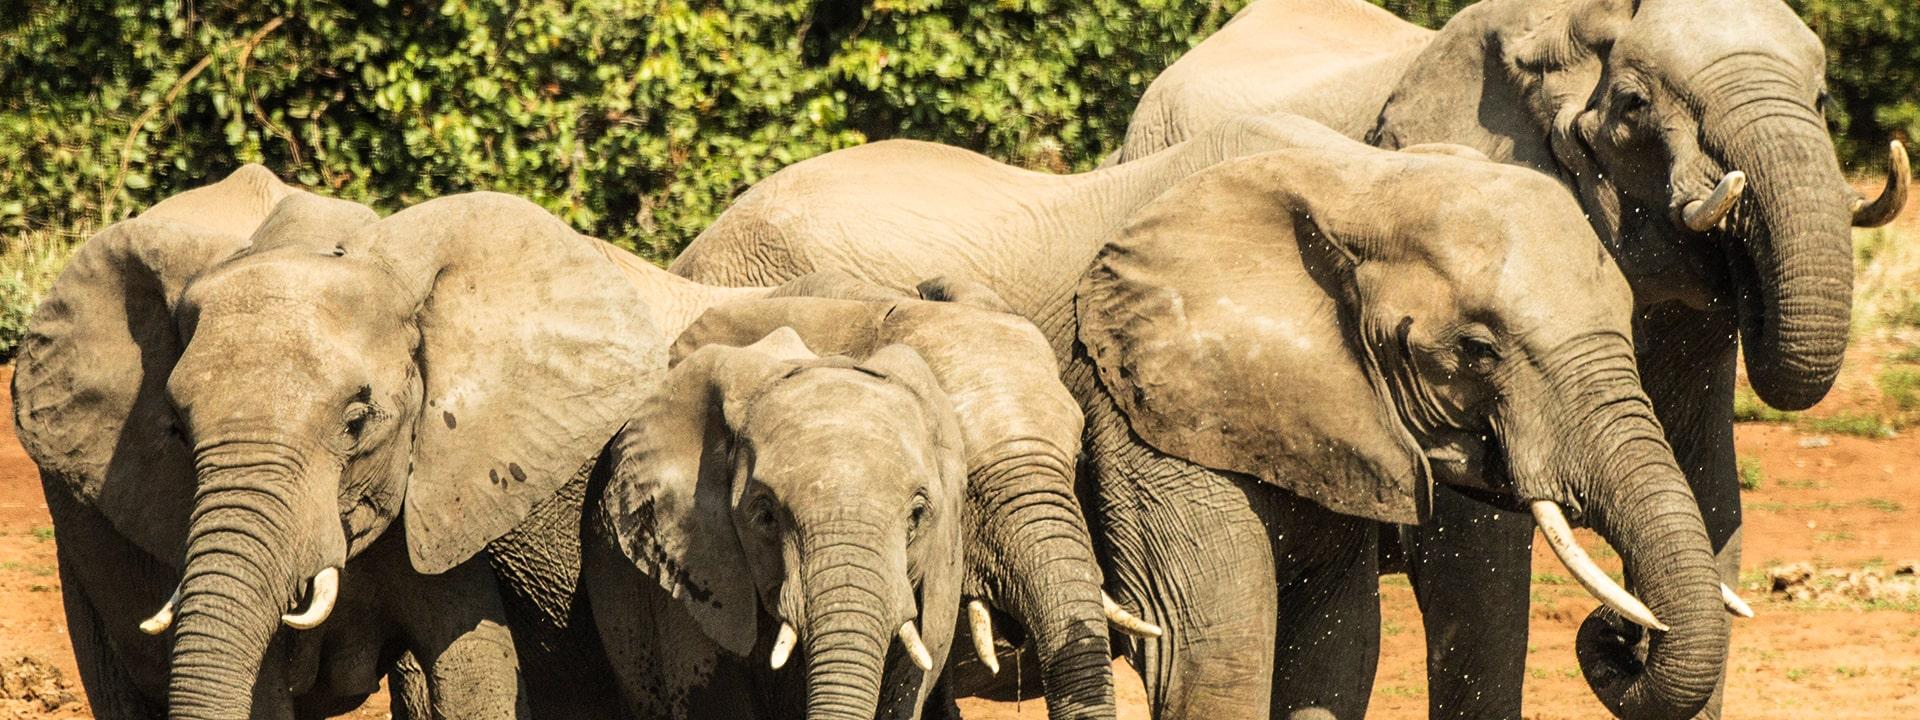 TB-2-Kruger-swasiland-elela-africa-elephants-reiseidee